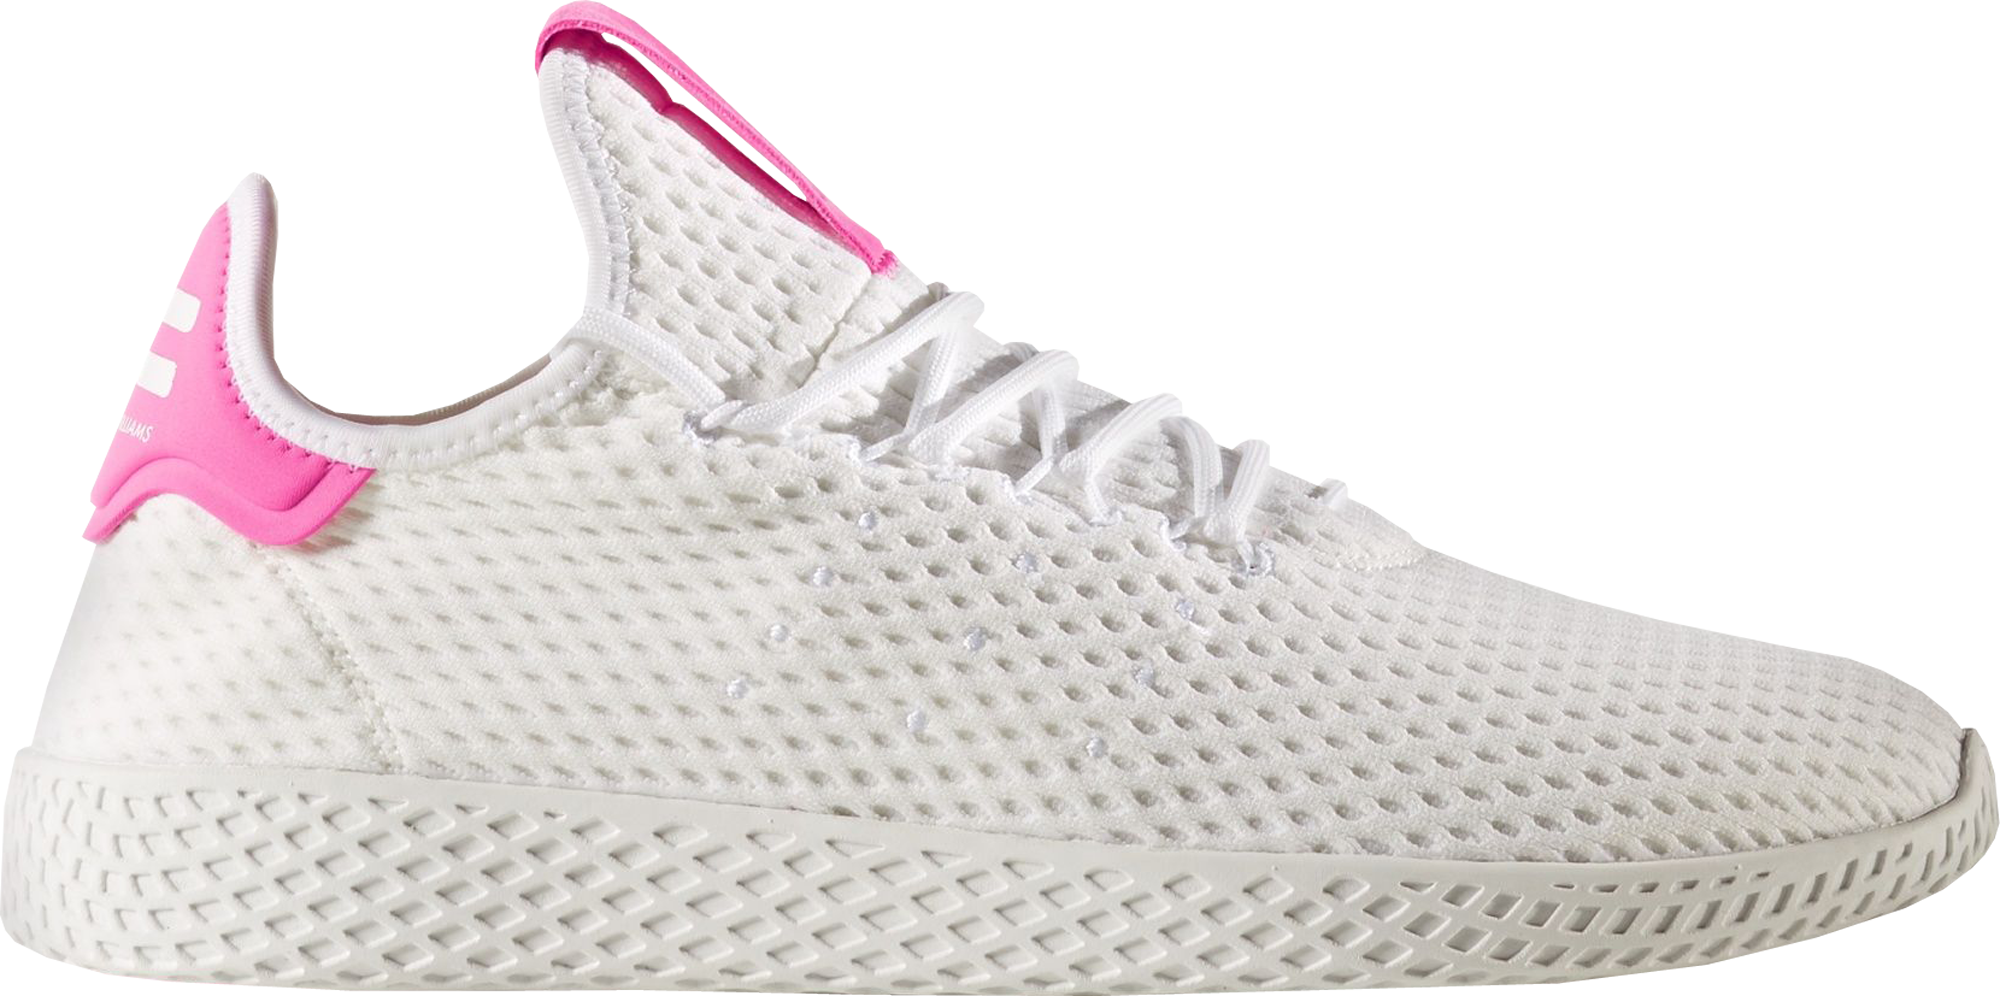 adidas Tennis Hu Pharrell Semi Solar Pink